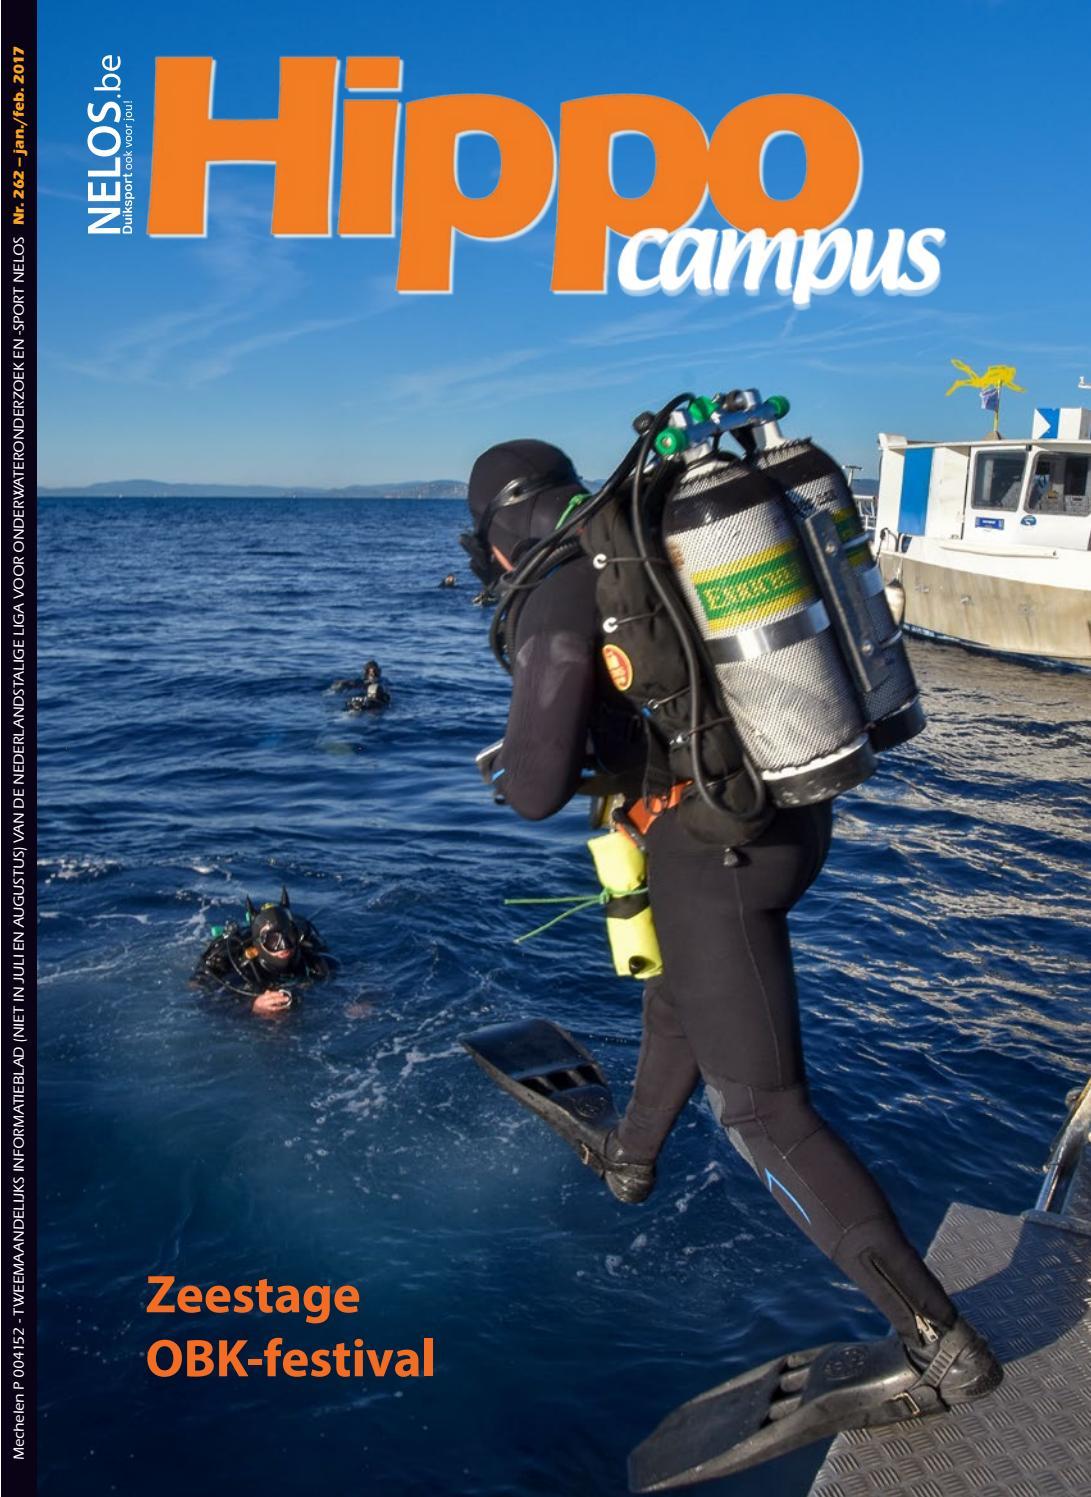 Hippocampus nr. 262 (jan./feb. 2017) by ivo madder   issuu